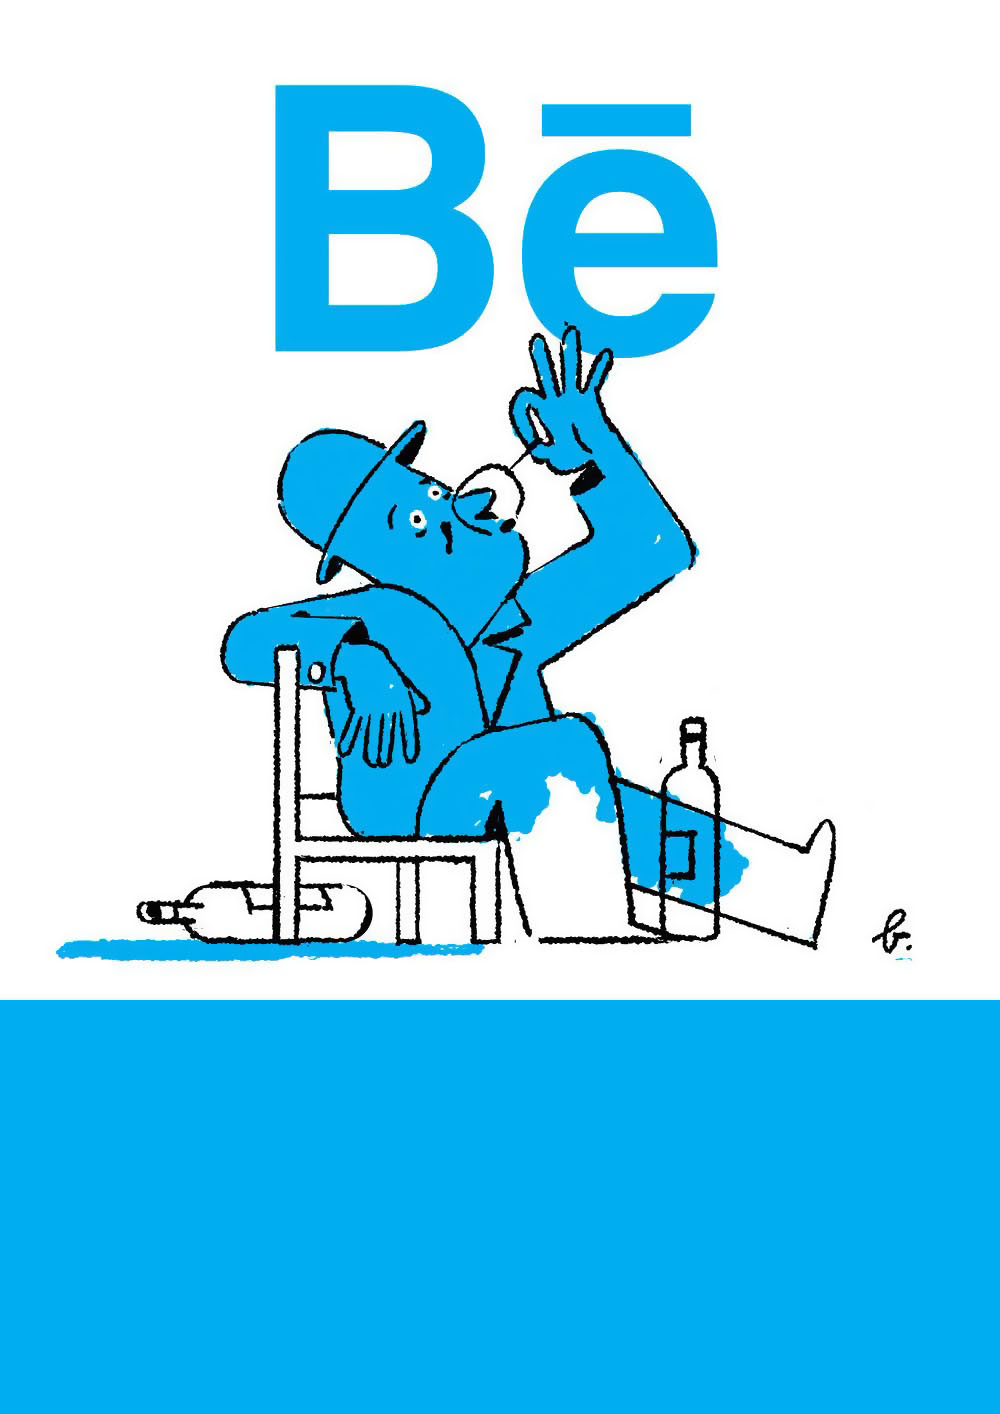 behancereviews poster Workshop Behance reviews Florence ied firenze zetafonts type design